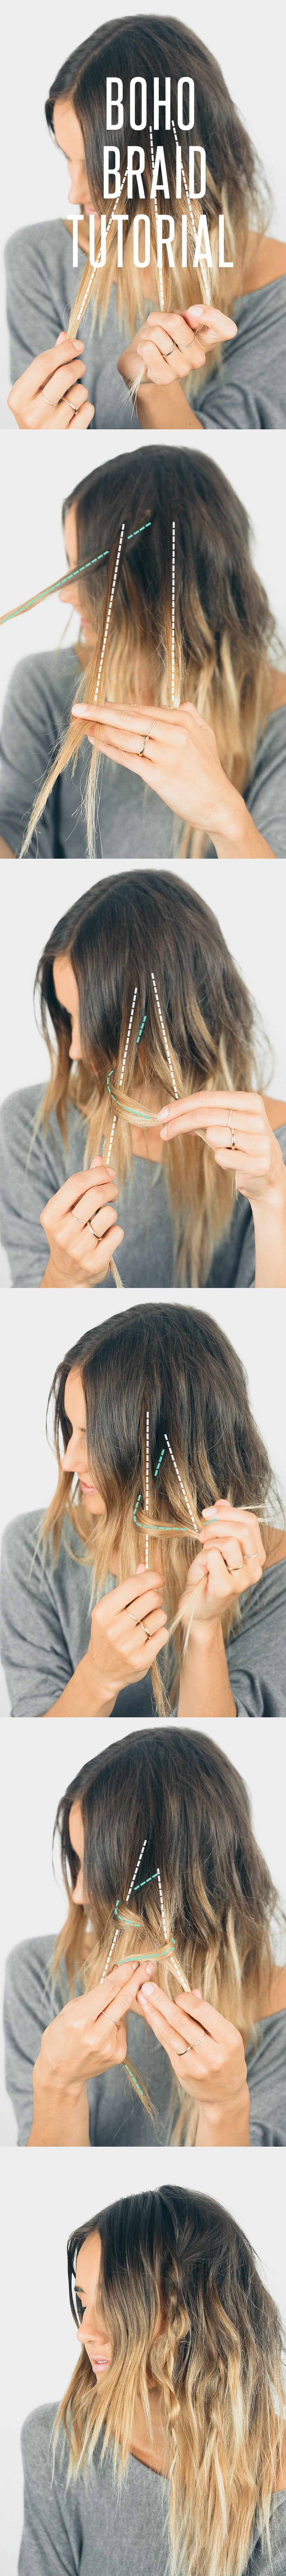 Hair tutorial boho braid braid tutorials boho and tutorials